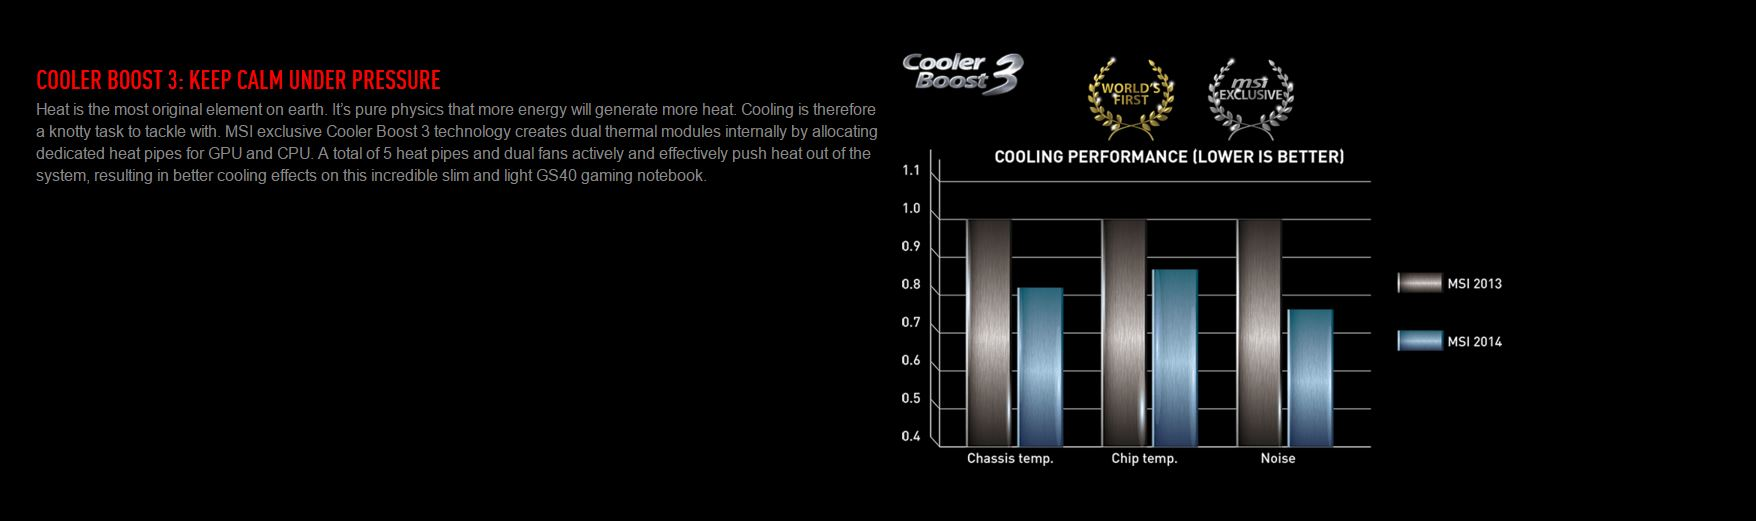 Cooler Boost 3